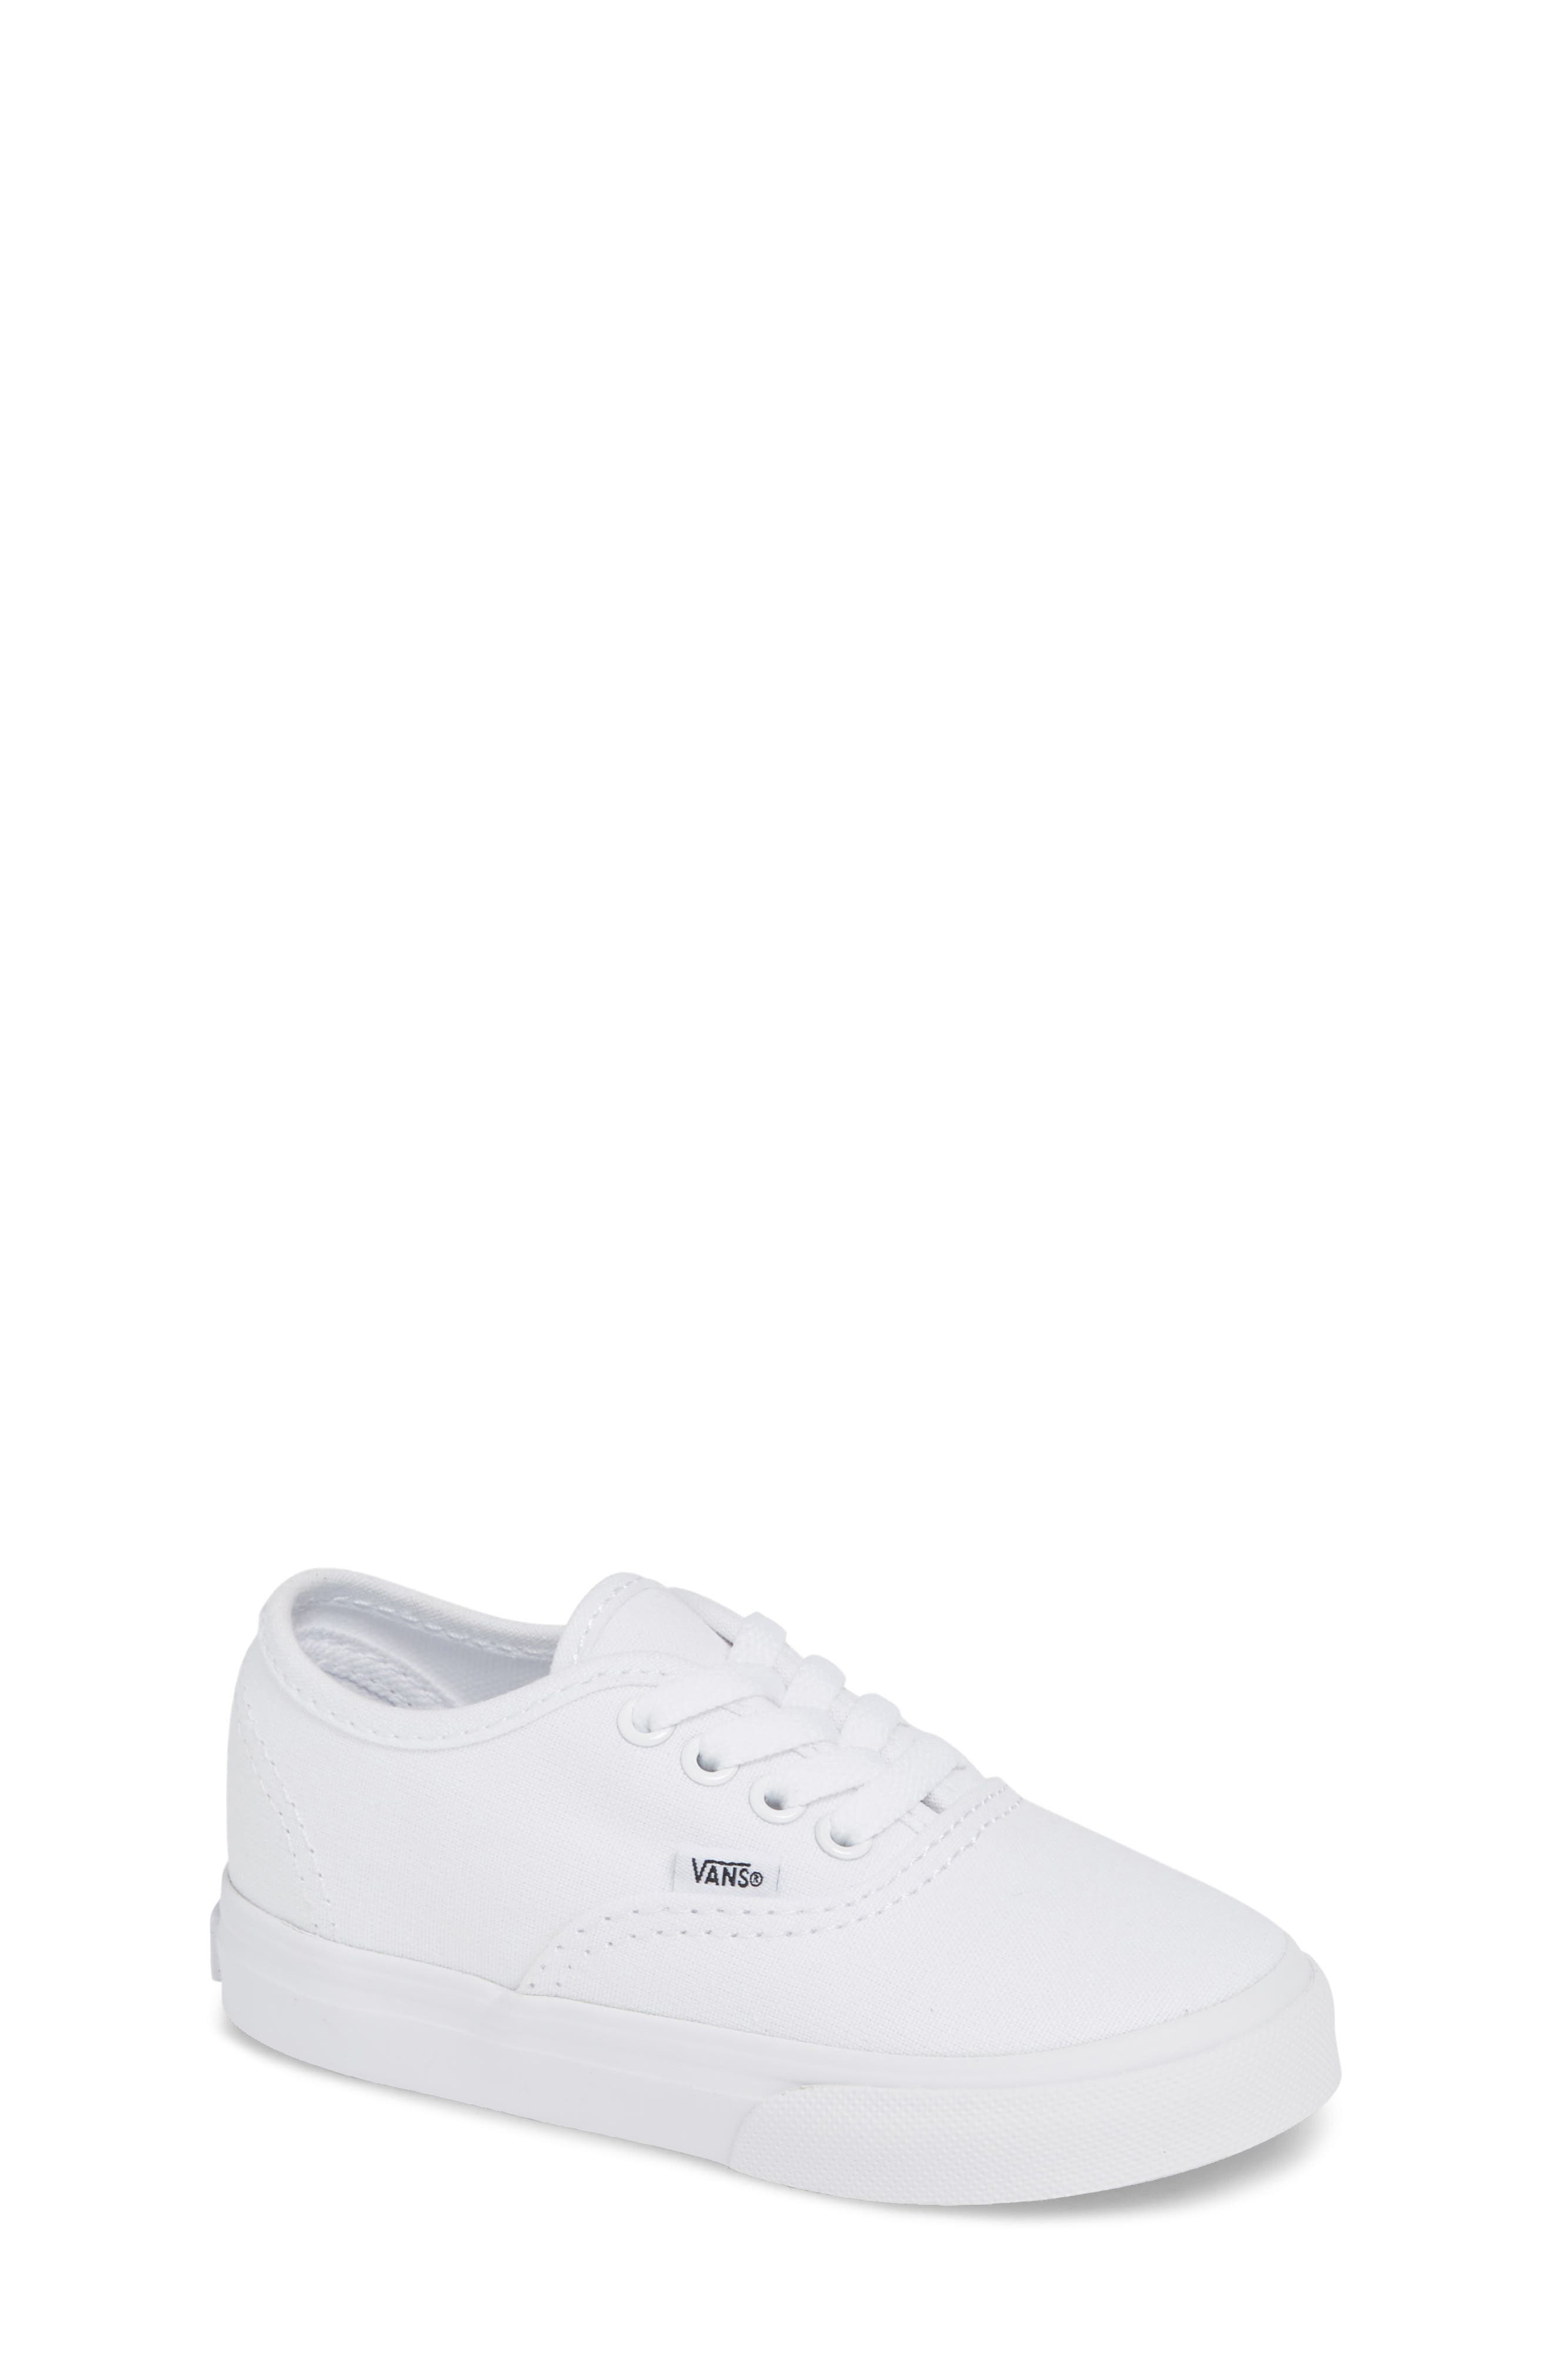 VANS, 'Authentic' Sneaker, Main thumbnail 1, color, TRUE WHITE/ WHITE